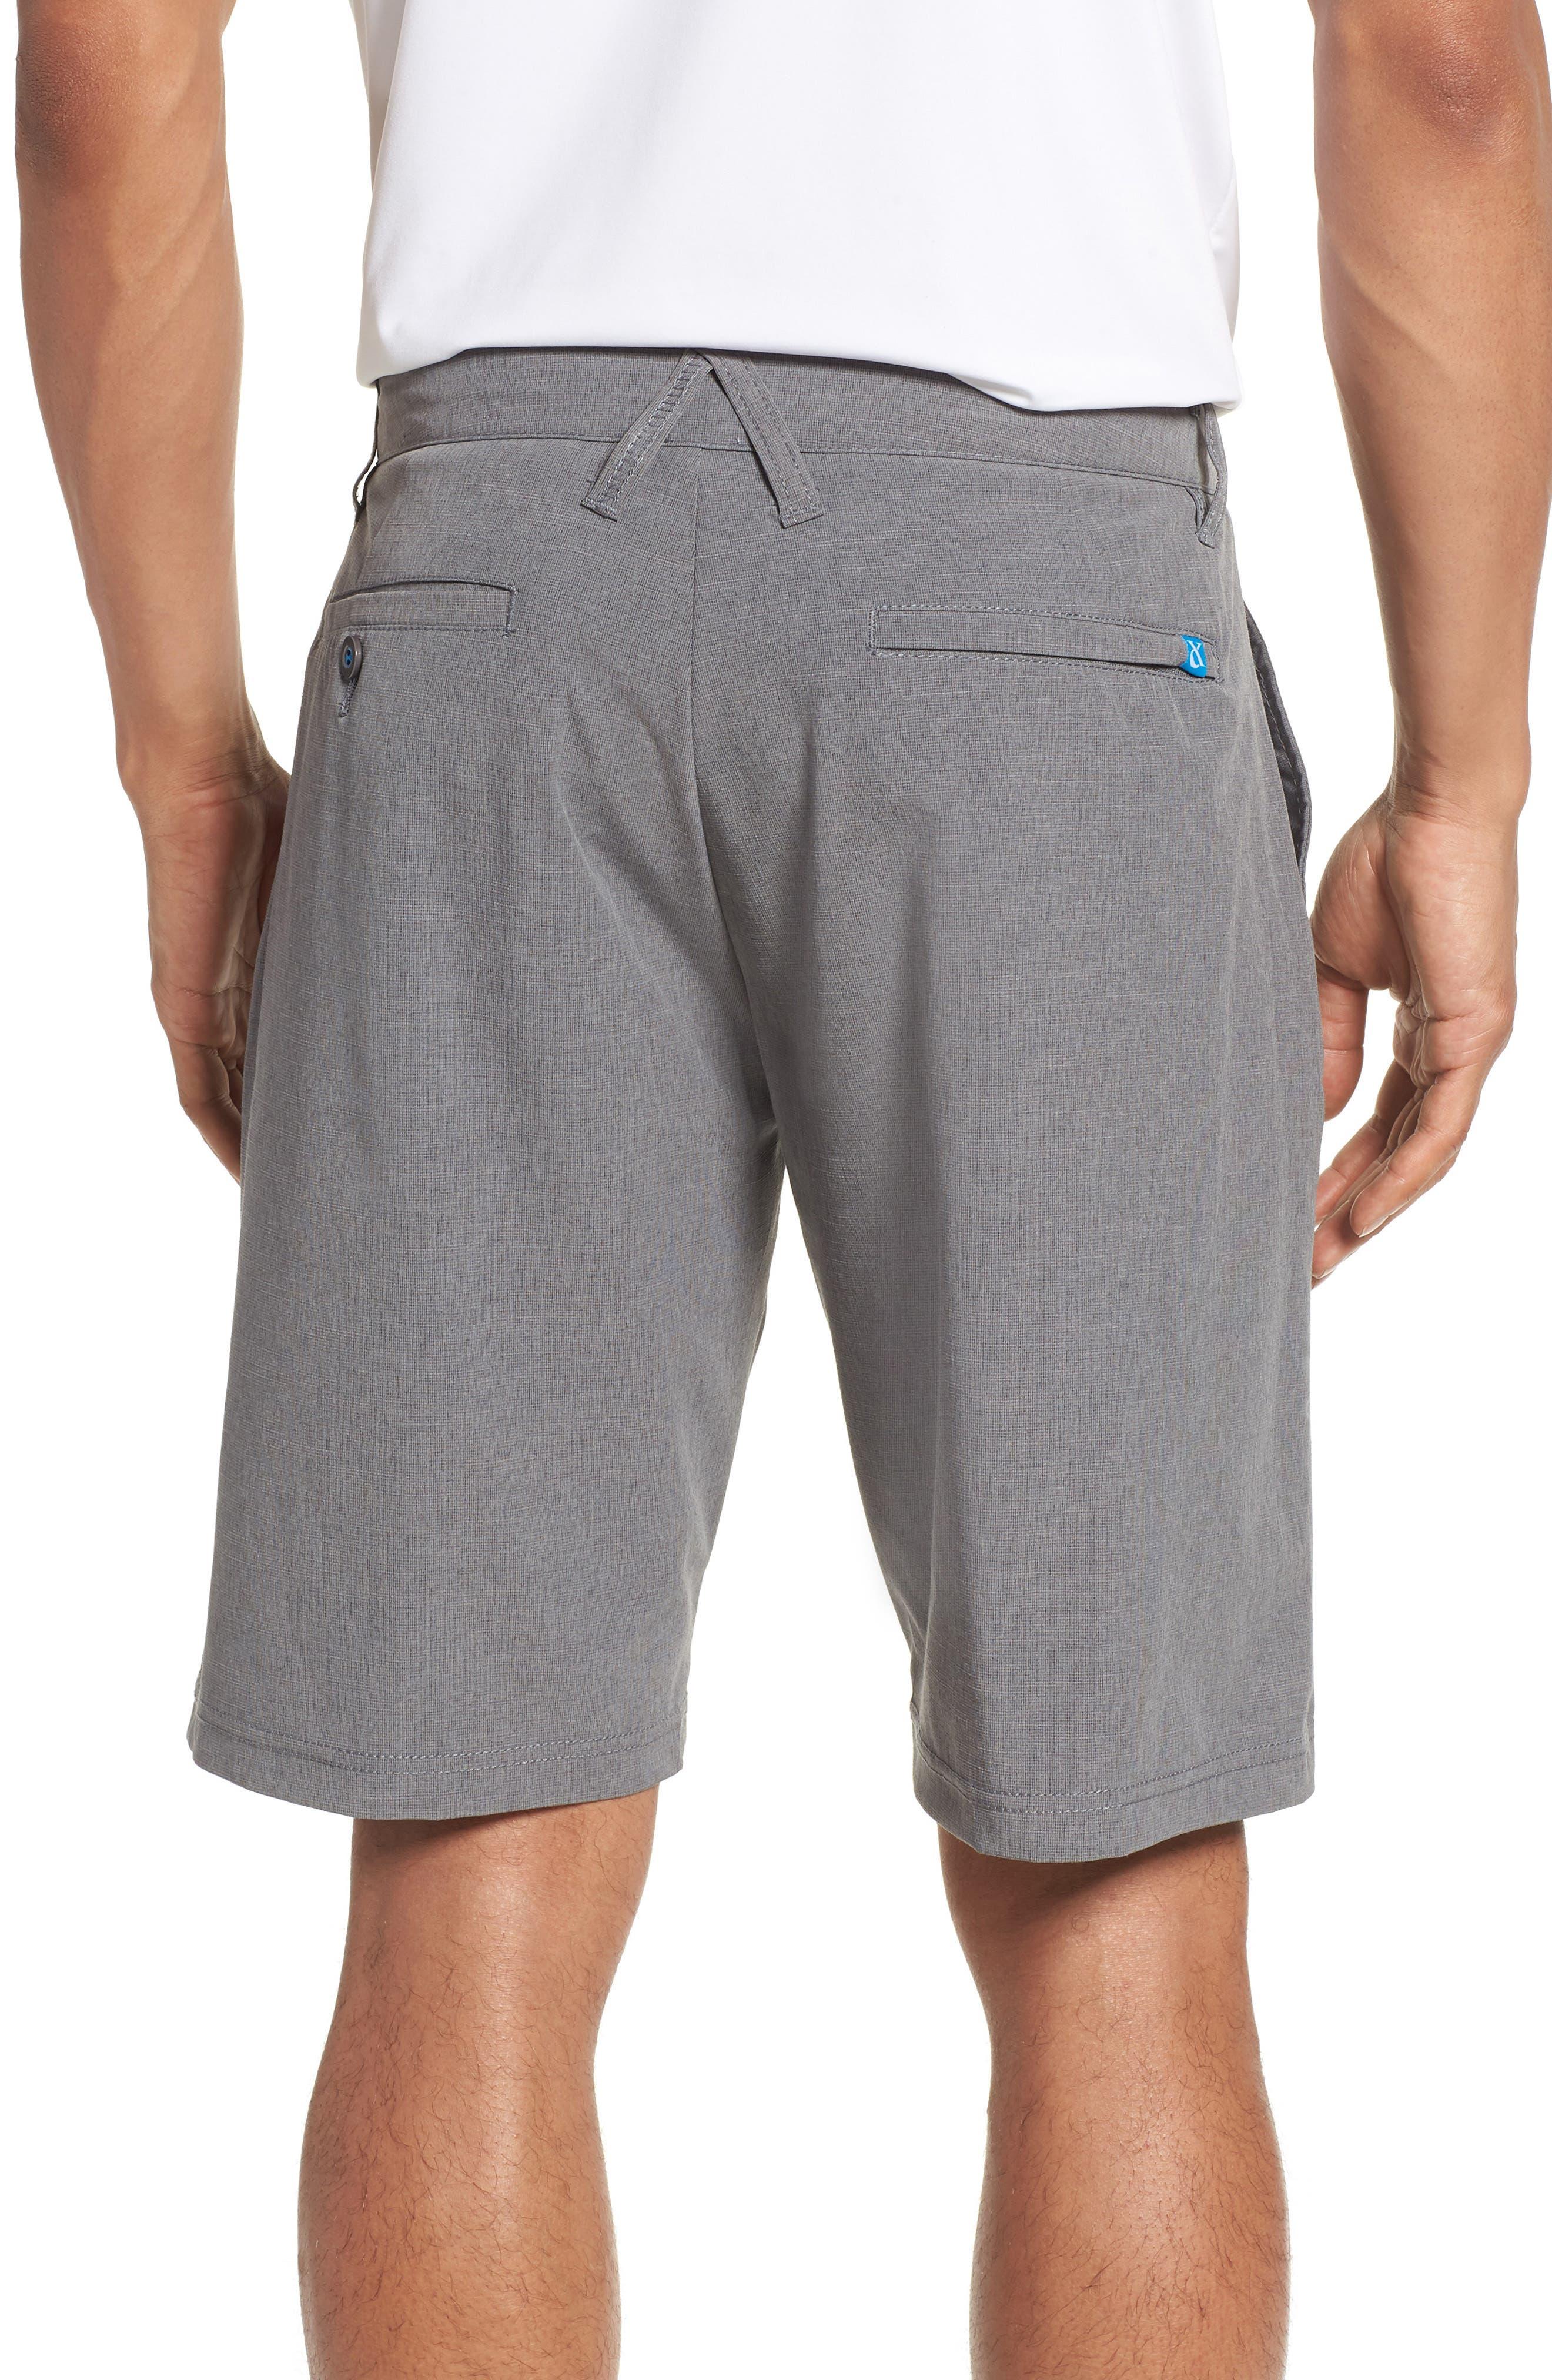 Cruiser Hybrid Shorts,                             Alternate thumbnail 2, color,                             CHARCOAL